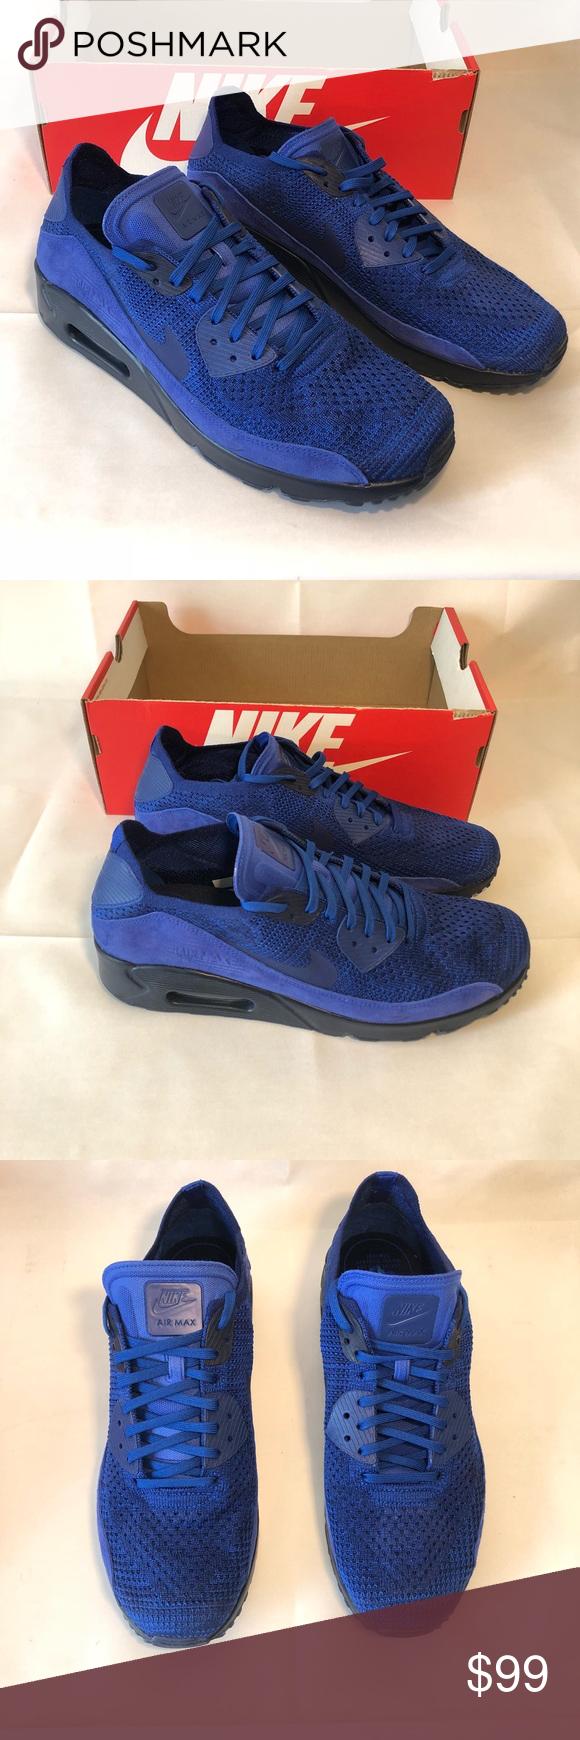 0fc728485dd74 Nike Air Max 90 Ultra2.0 Flyknit 875943-Blue Royal Nike Air Max 90 ...